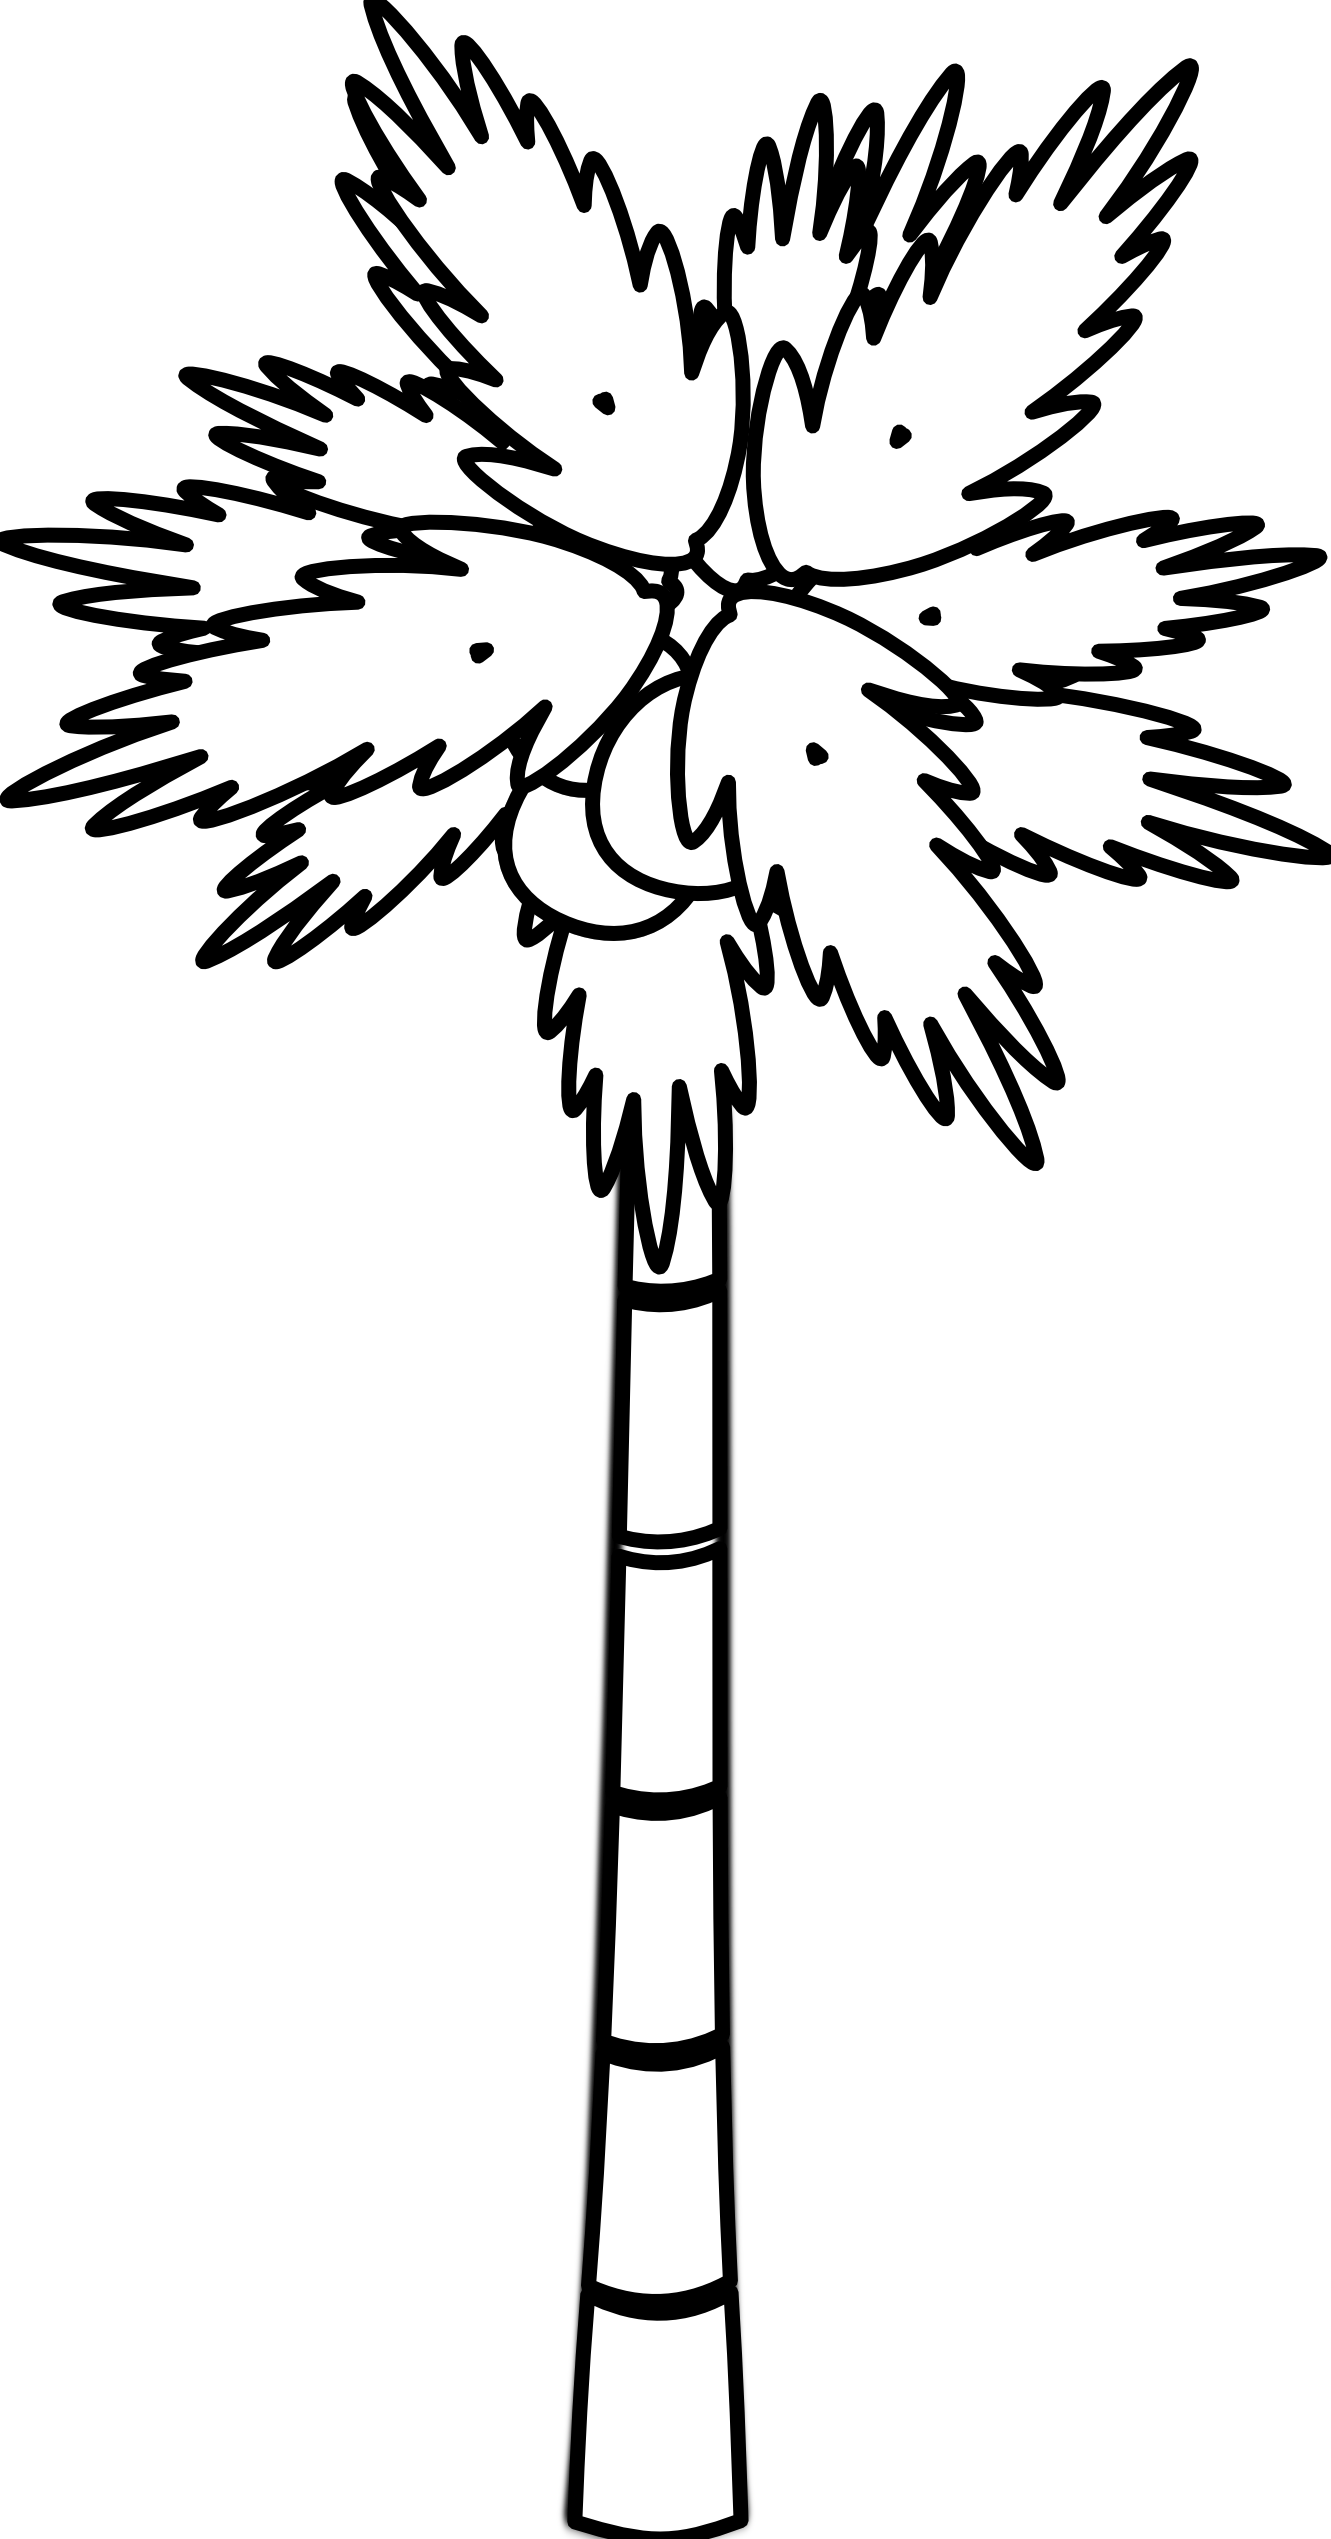 svg free Tree rigezdxil. Lake clipart black and white.